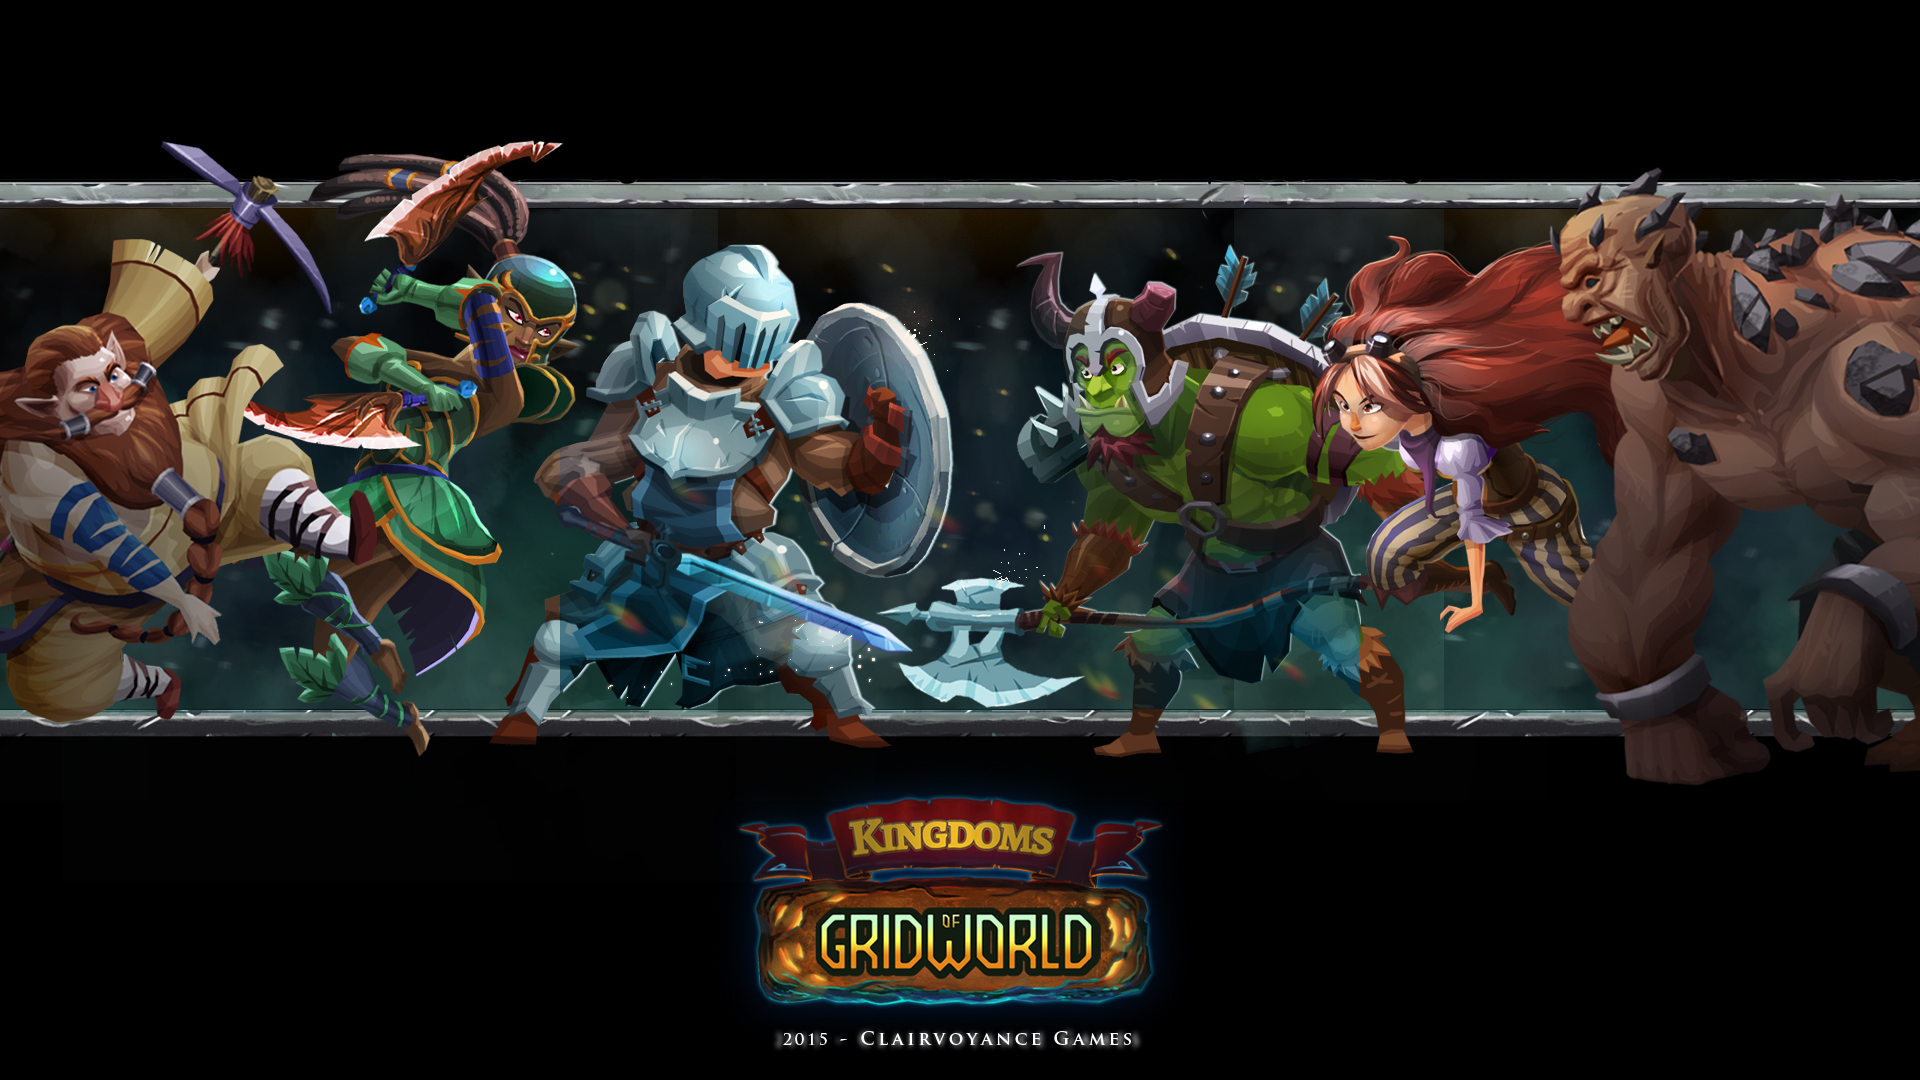 Kingdom of GridWorld header